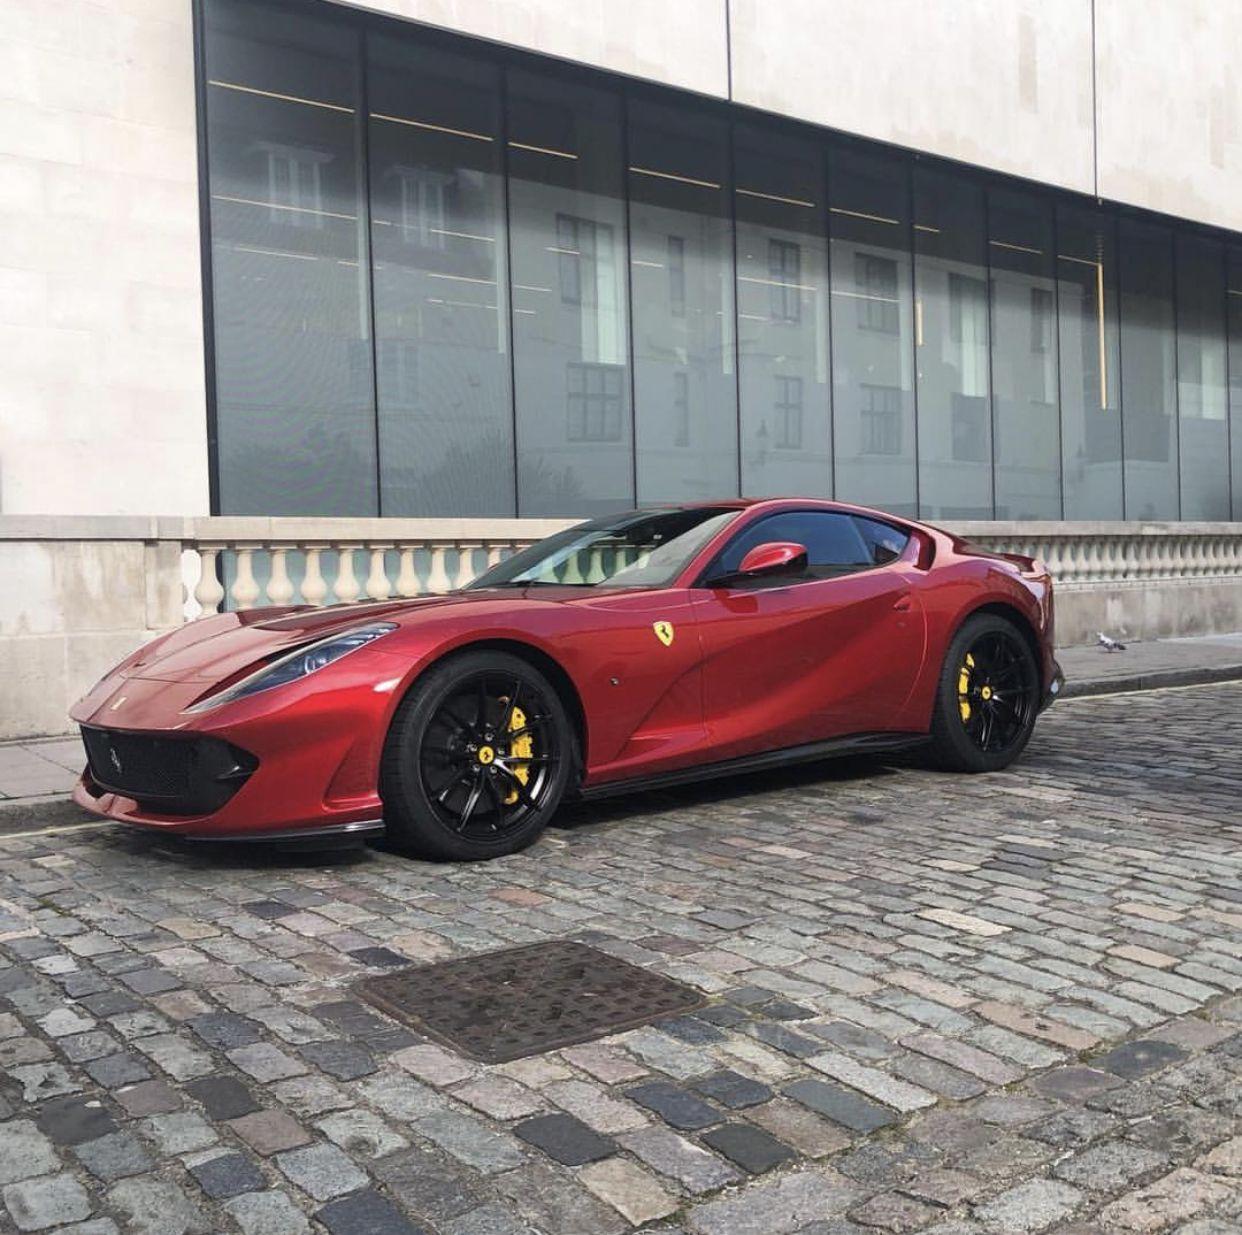 Ferrari 812 Superfast Painted In Rosso Fuoco Photo Taken By Sirzeta On Instagram Owned By Sirzeta On Instagram Motorsykler